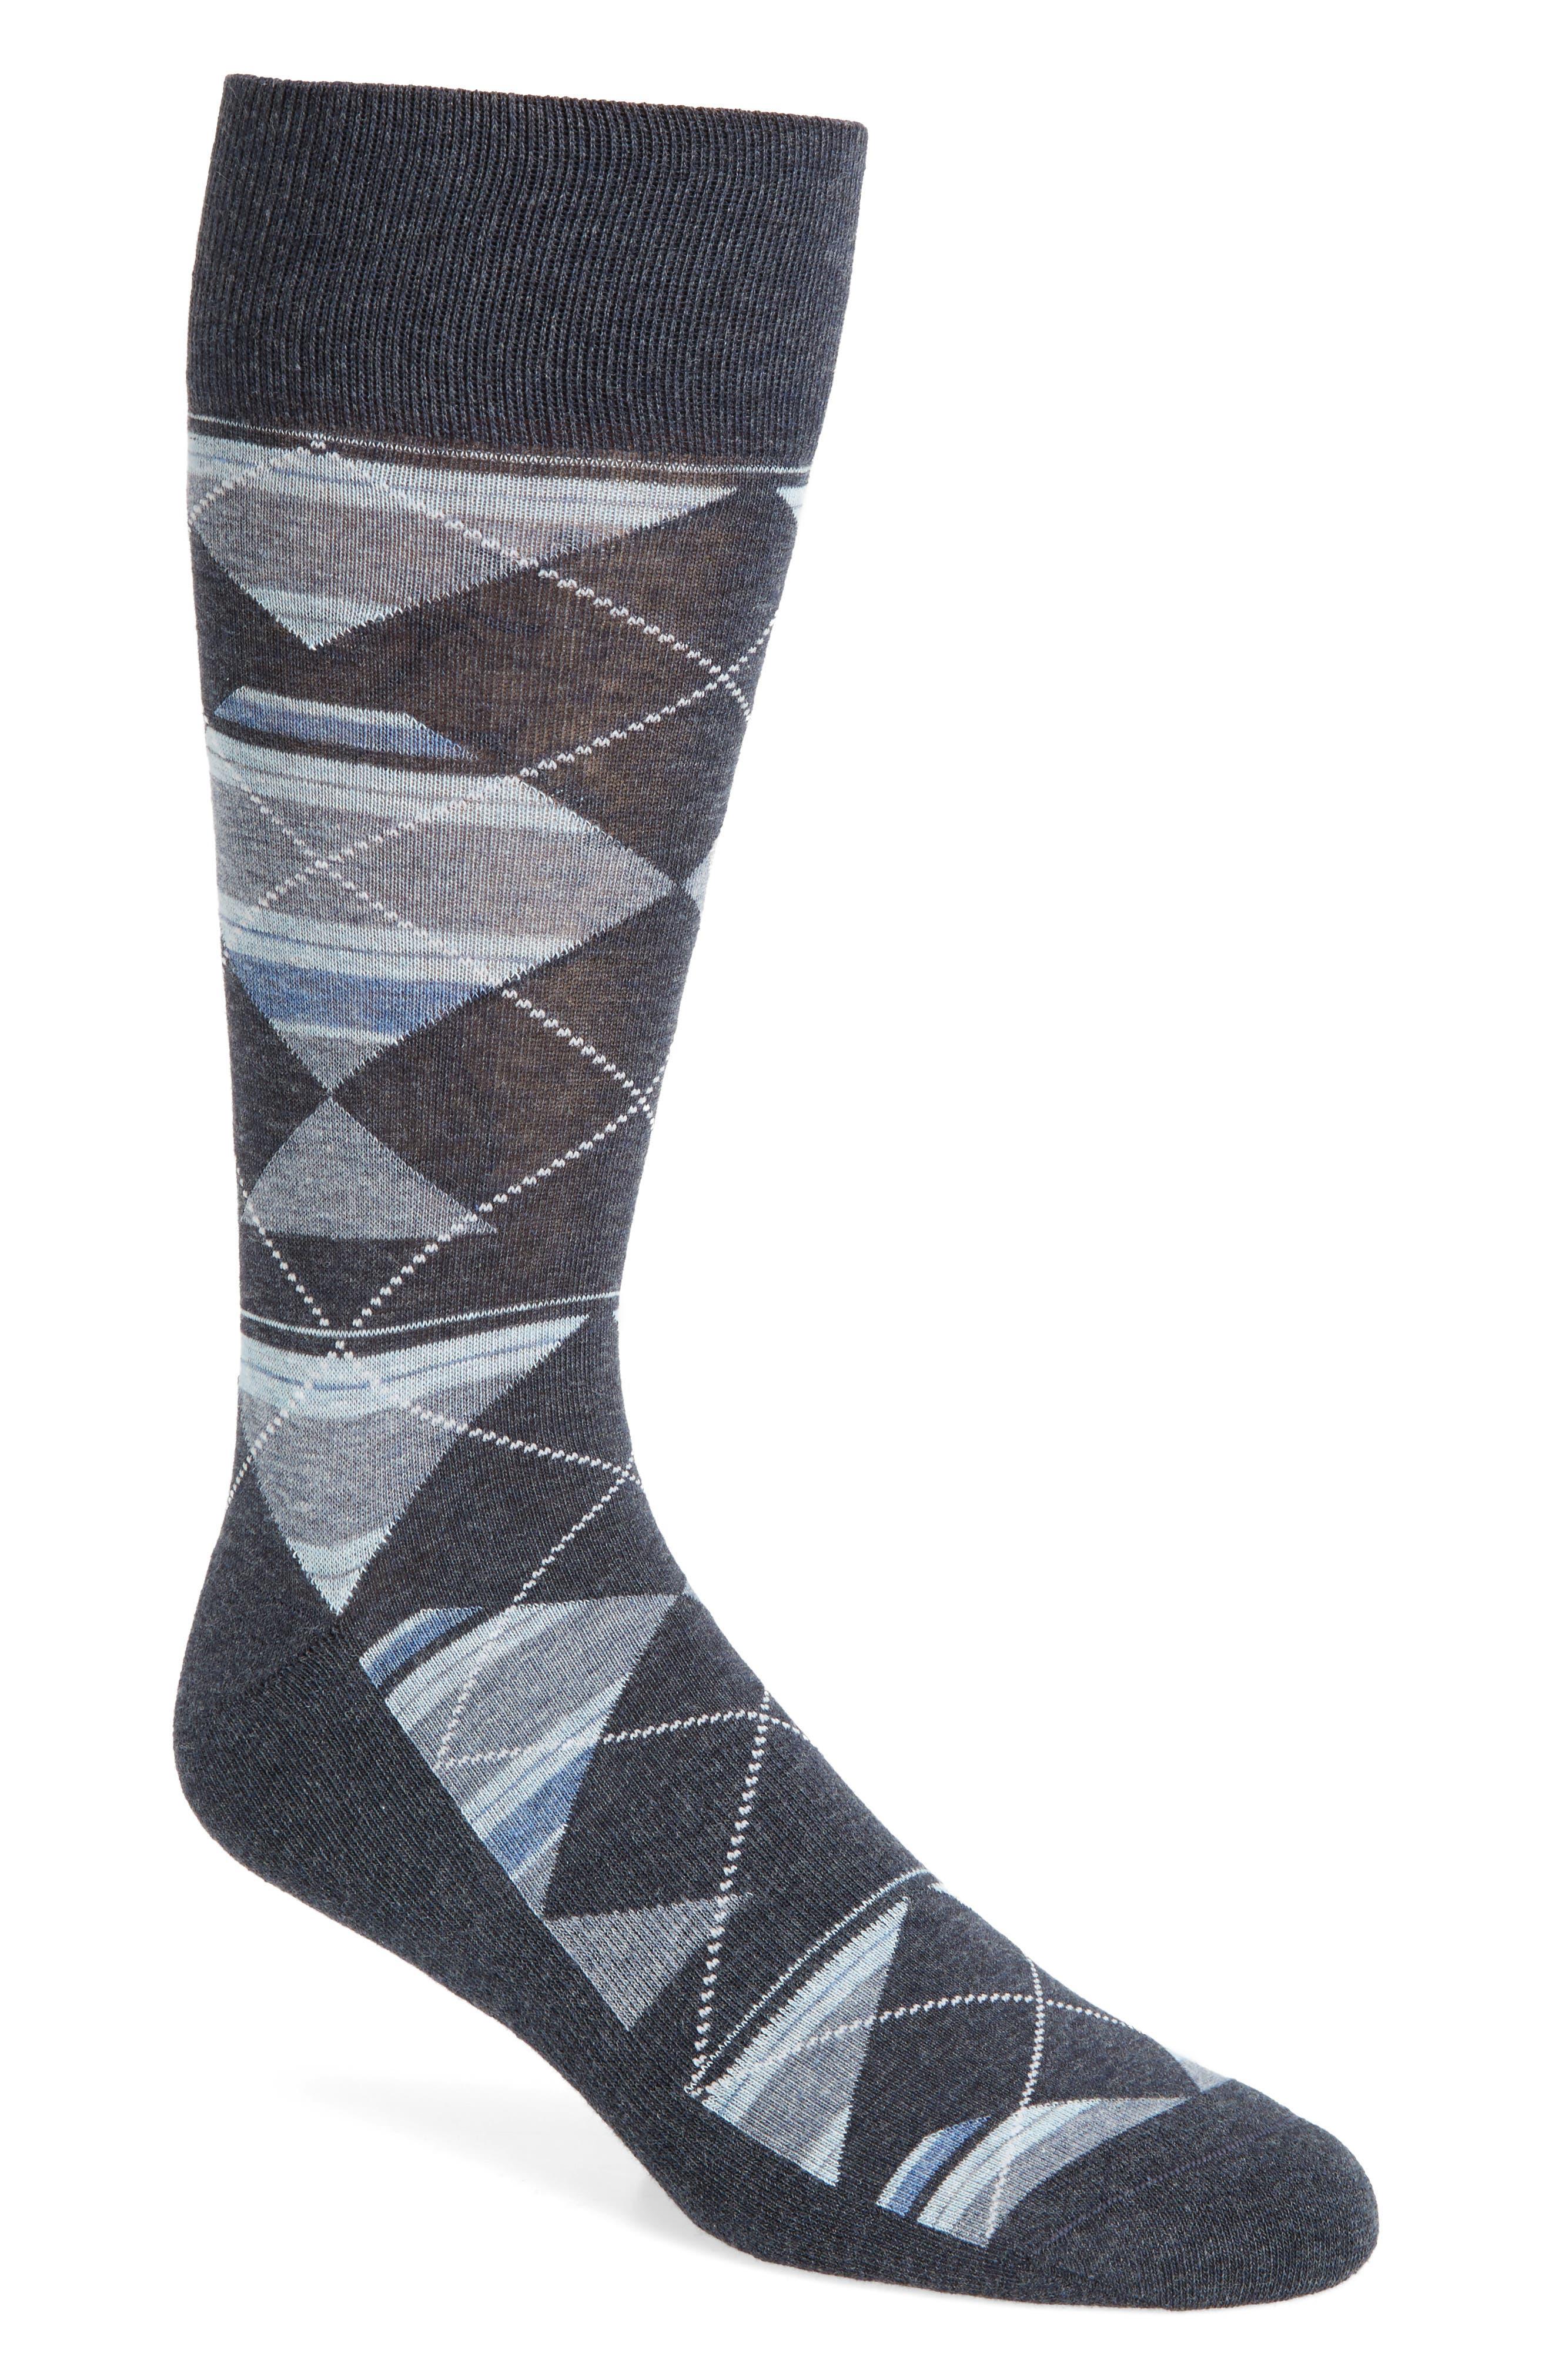 Main Image - Nordstrom Men's Shop Multistripe Argyle Socks